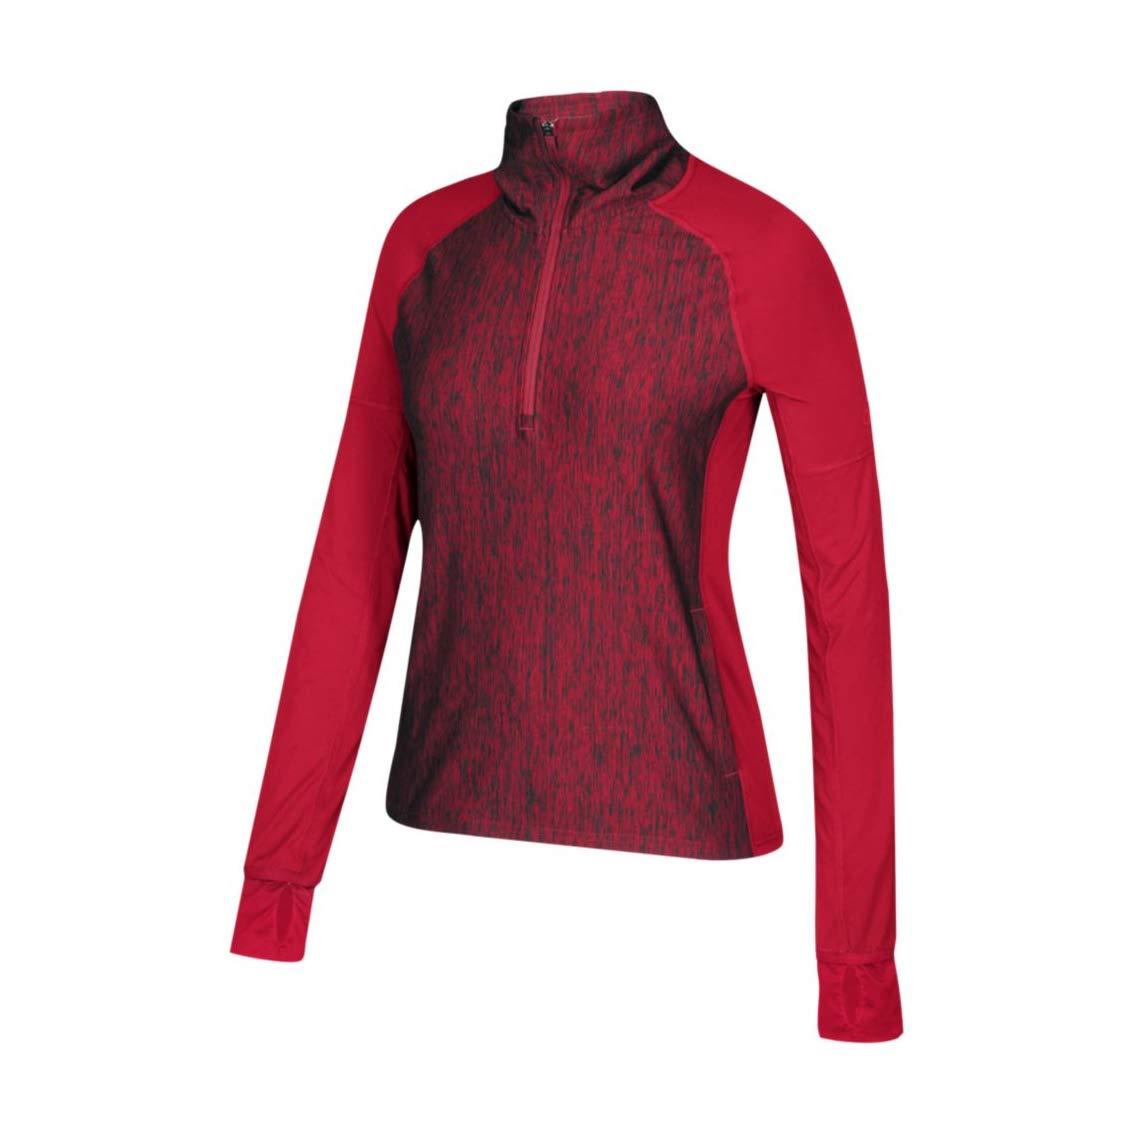 adidas Performance Baseline 1/4 Zip Top- Women's Multi-Sport XS Power Red